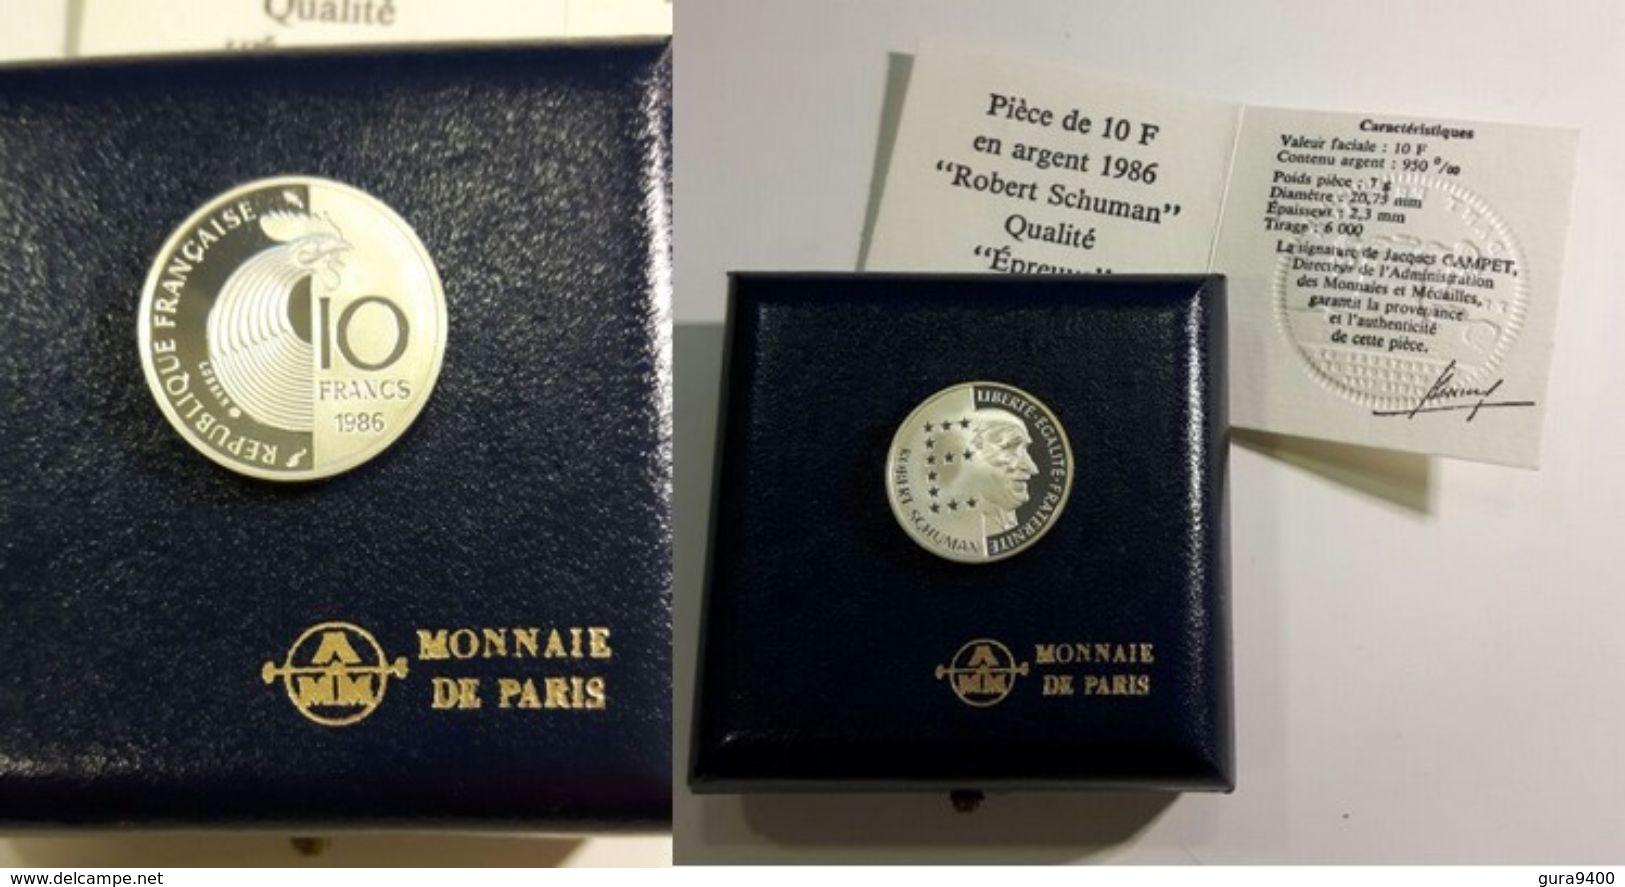 France, 10 Francs, 1986 Robert Schumann - France